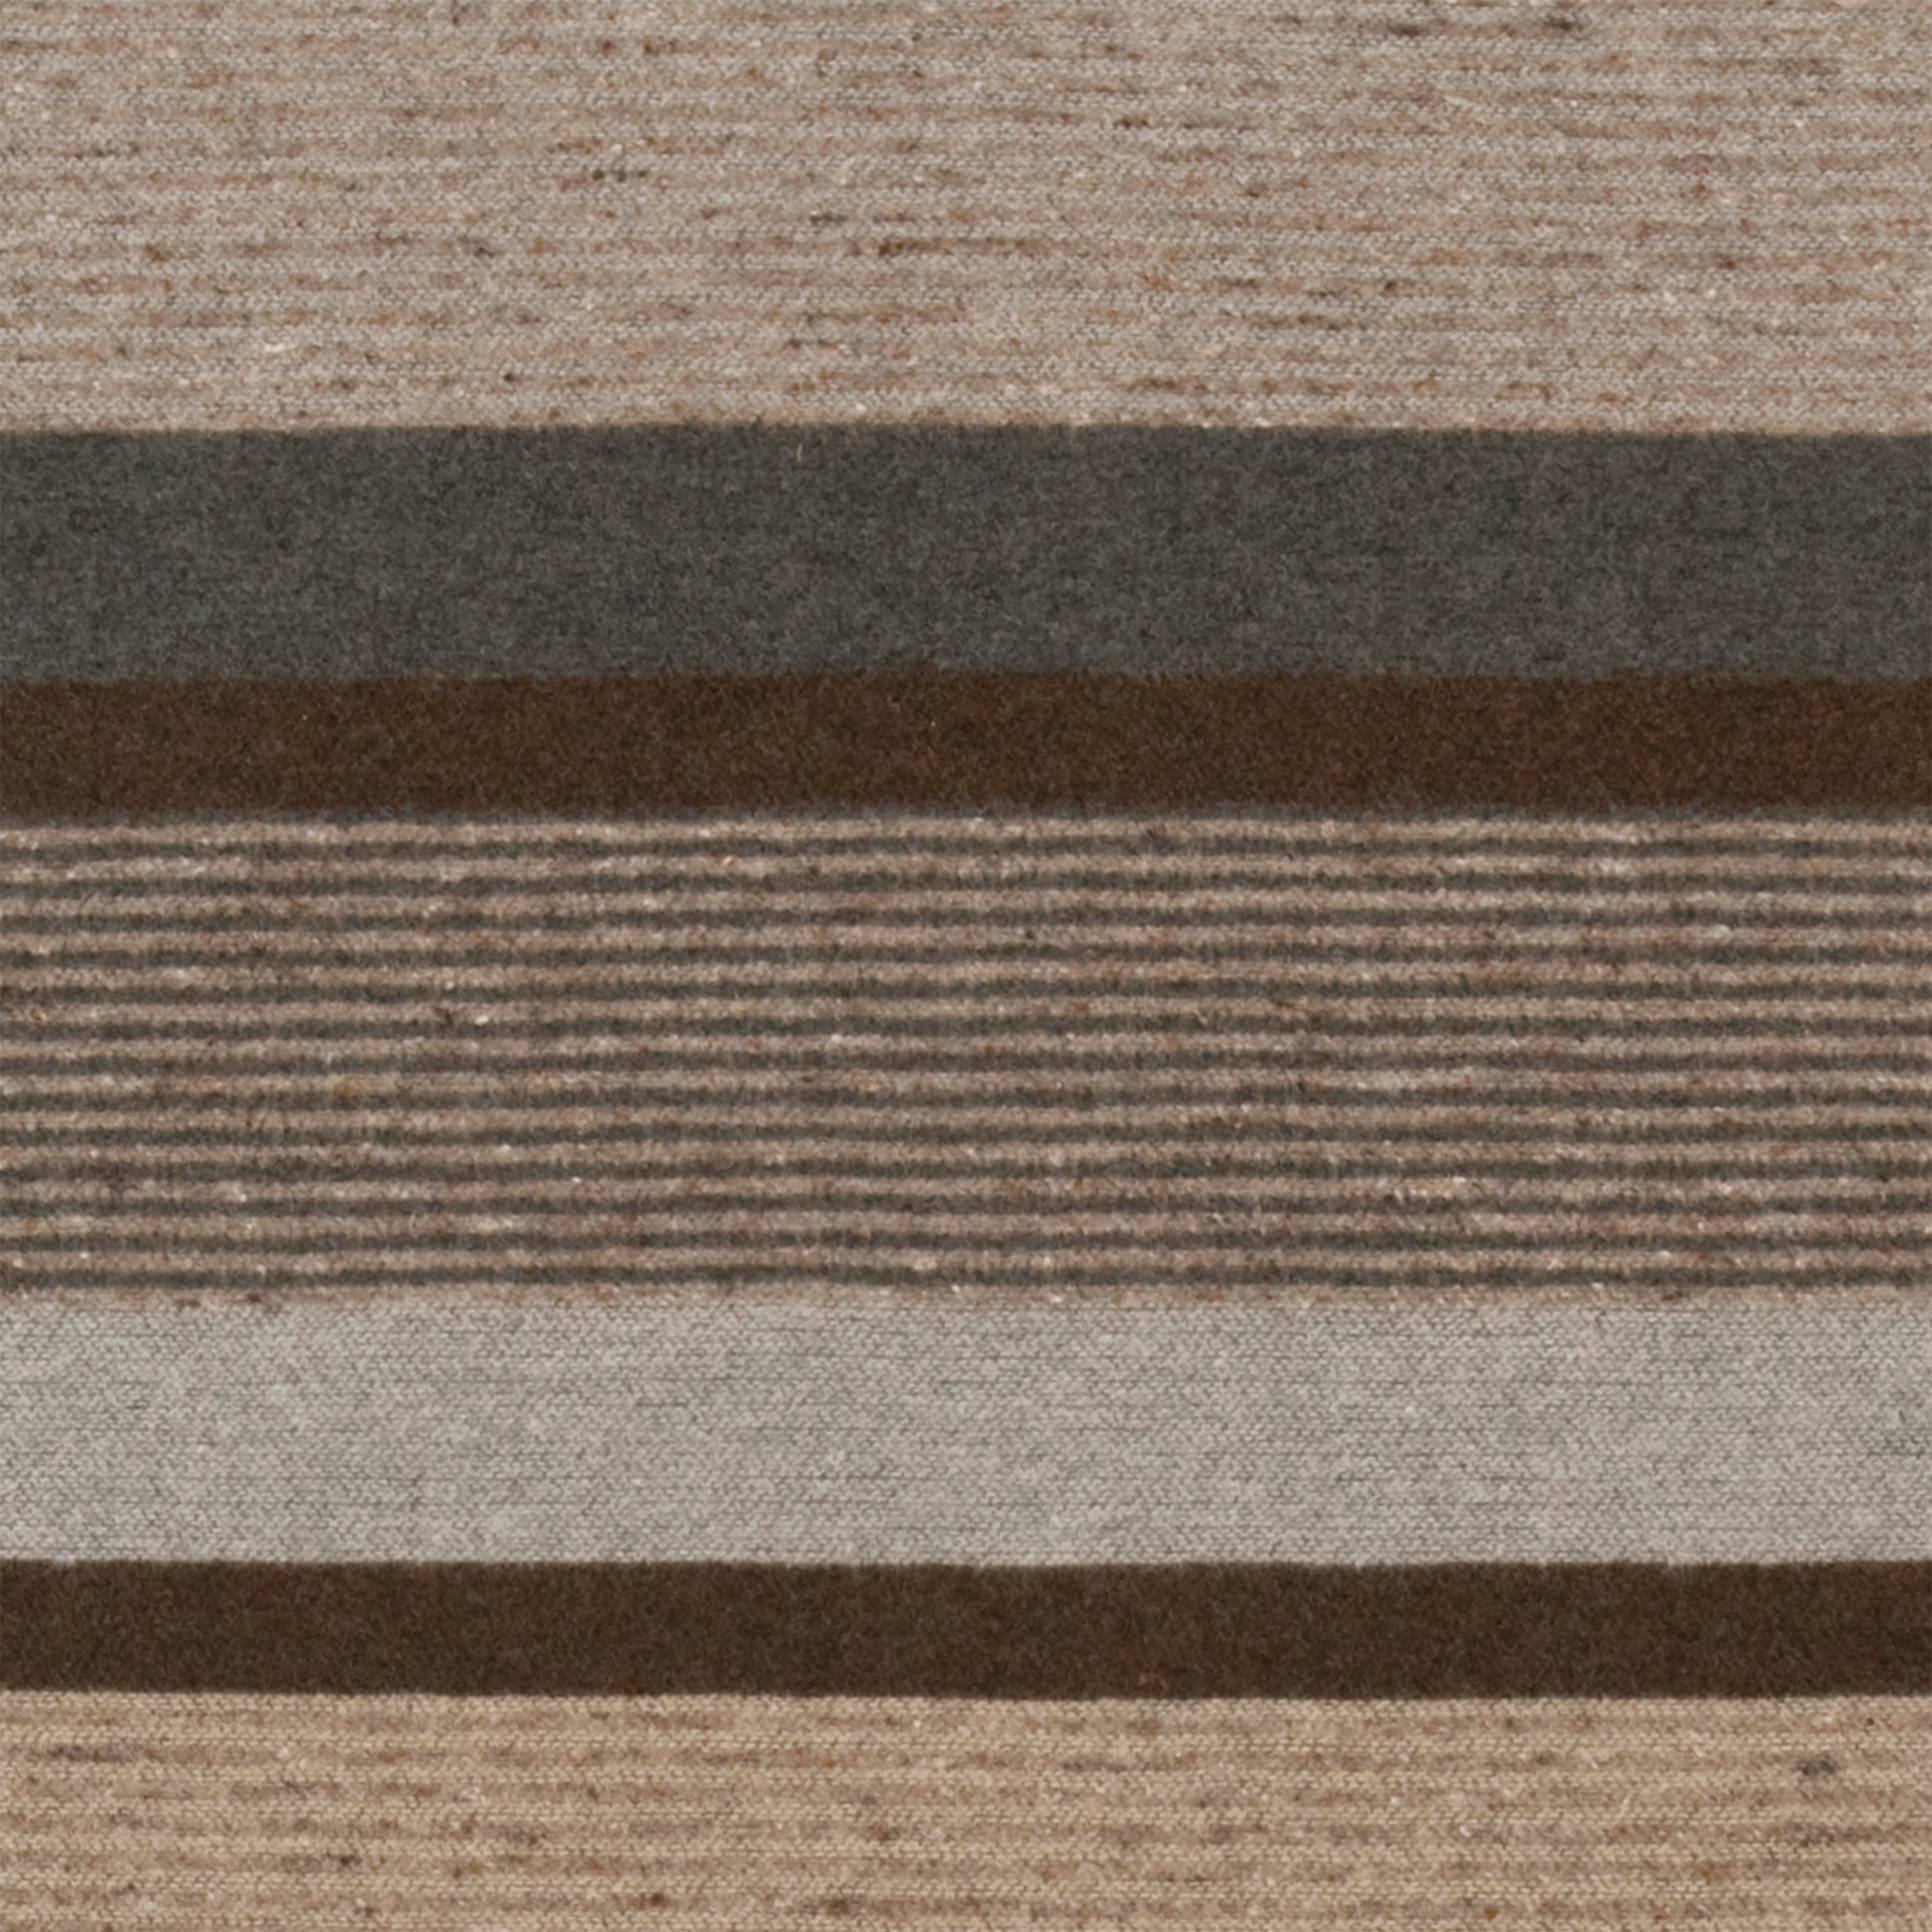 Sandstone (Wool-Blend)